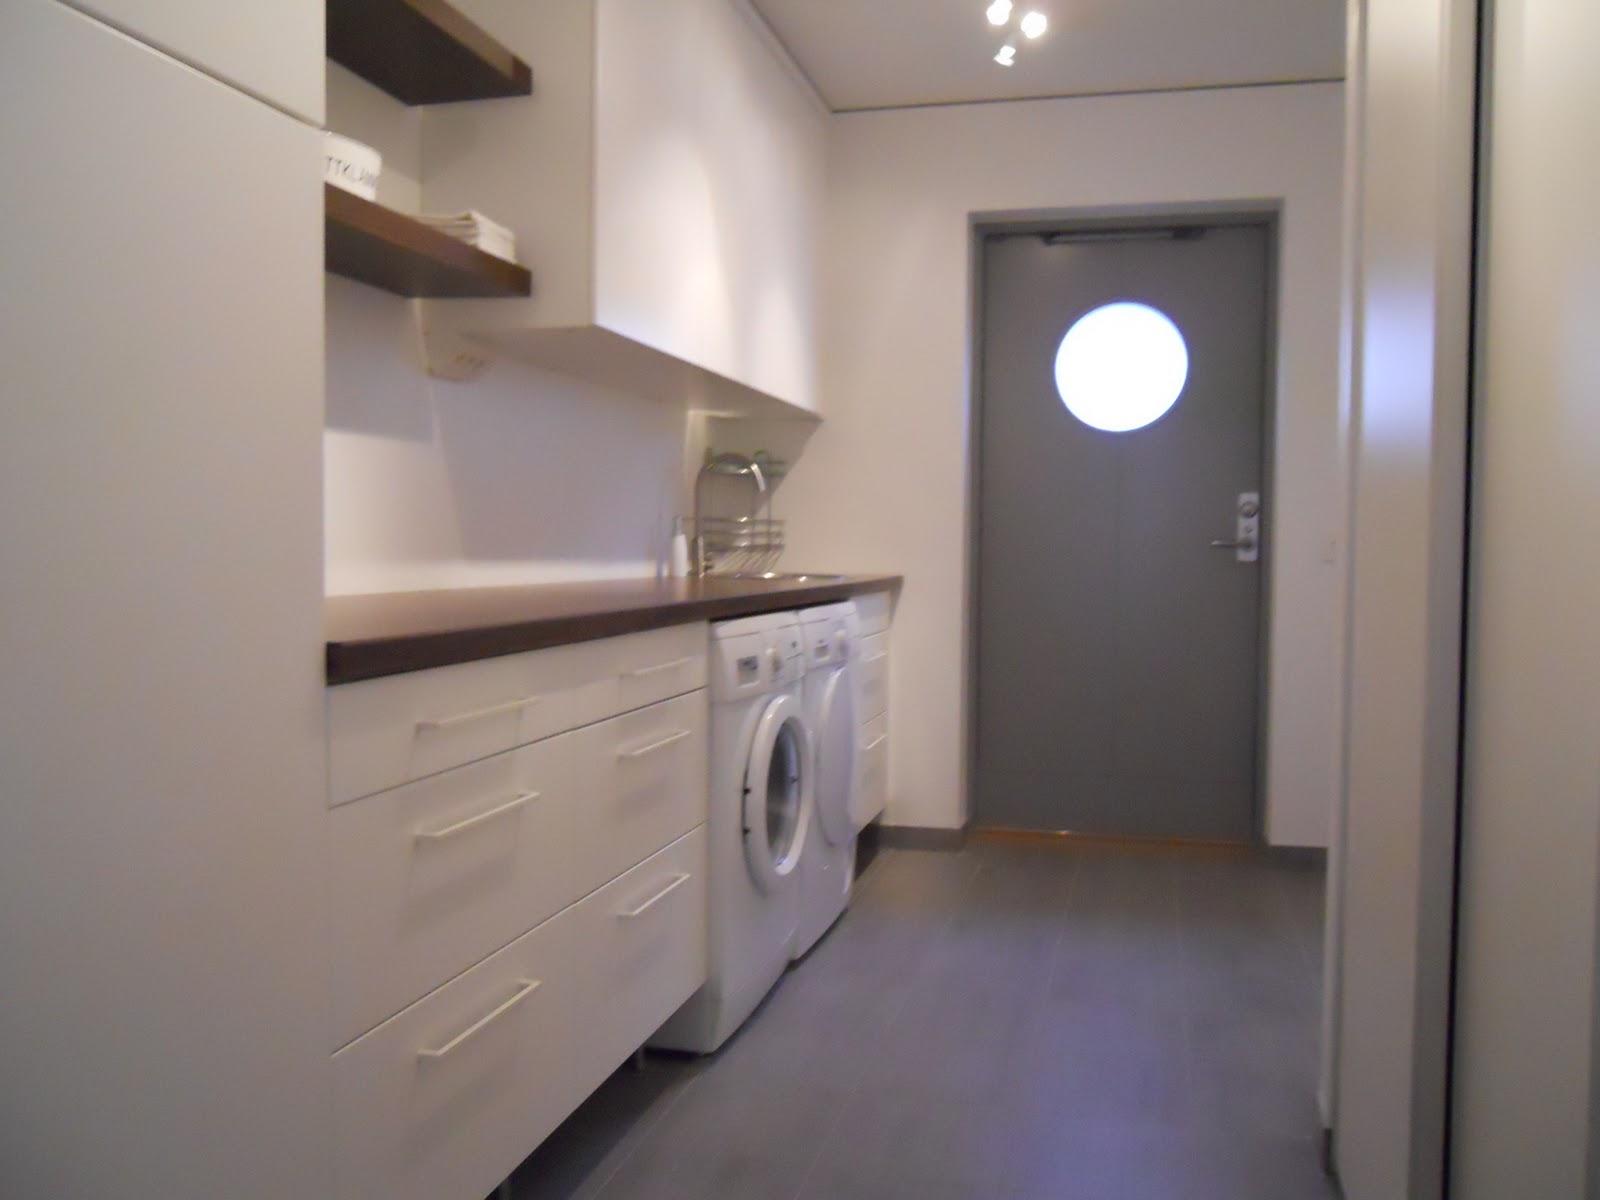 Bänk till badrummet ~ xellen.com